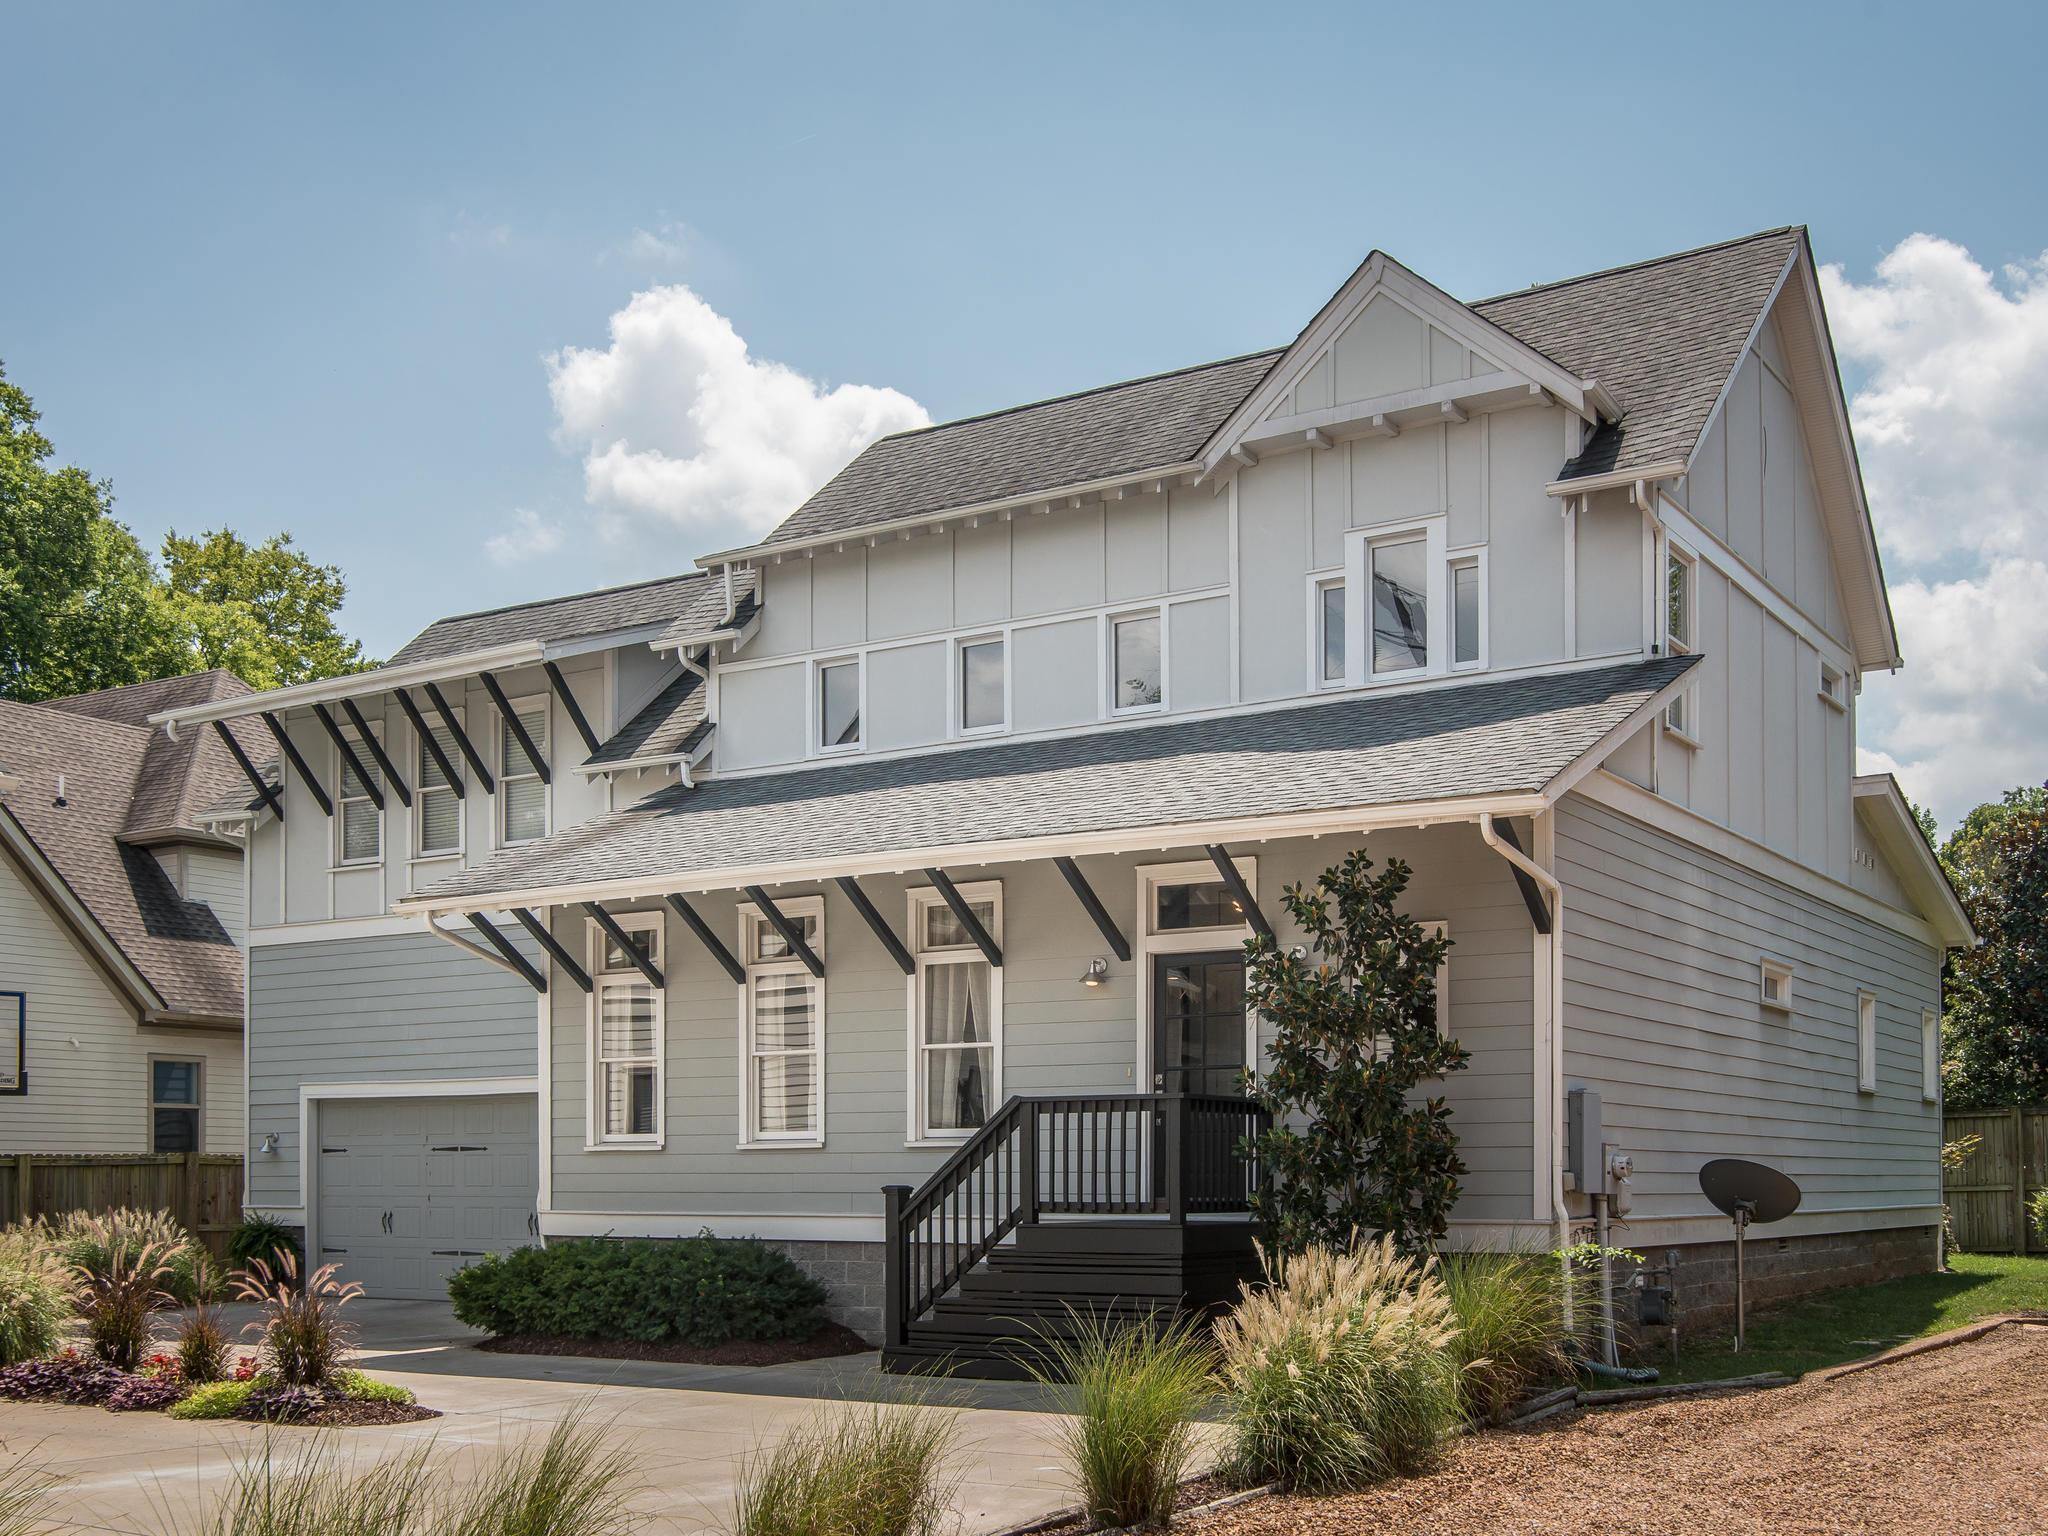 1537B Battlefield Dr, Nashville, TN 37215 - Nashville, TN real estate listing